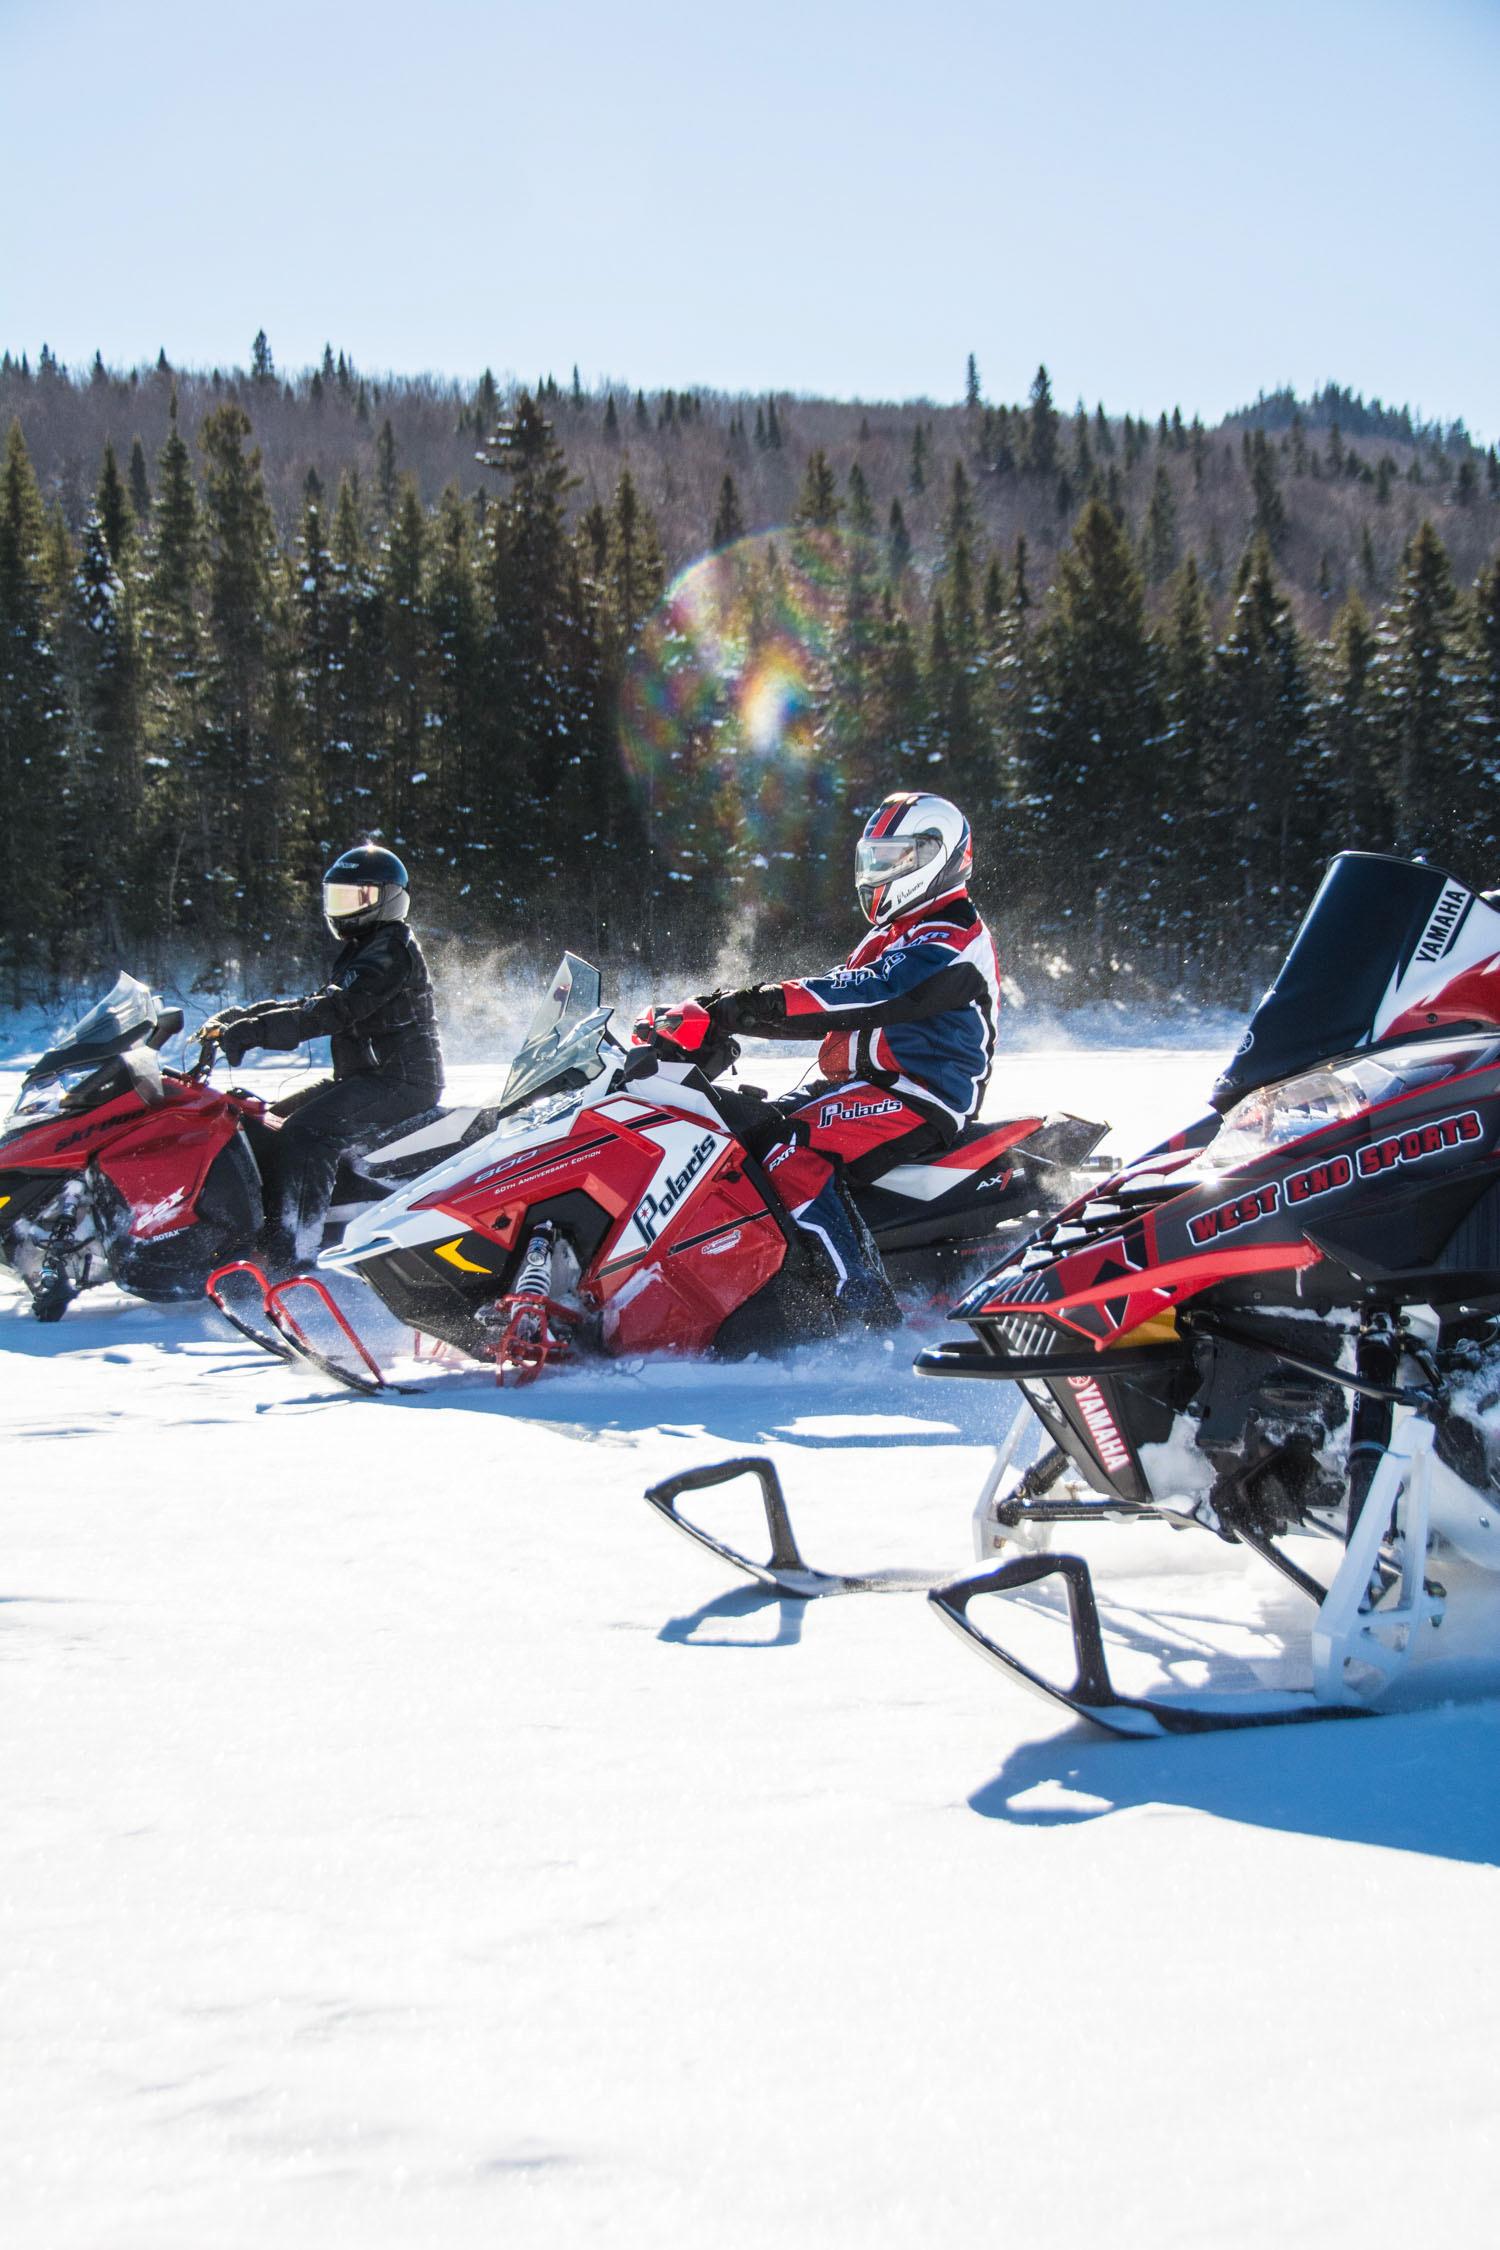 feb10-11 2015-Tourism New Brunswick-T4G Kick-winter 2015-New Brunswick Great Northern Odyssey-snowmobile trip-Mount Carleton-NB-photo by Aaron McKenzie Fraser-www.amfraser.com-_AMF4725.jpg